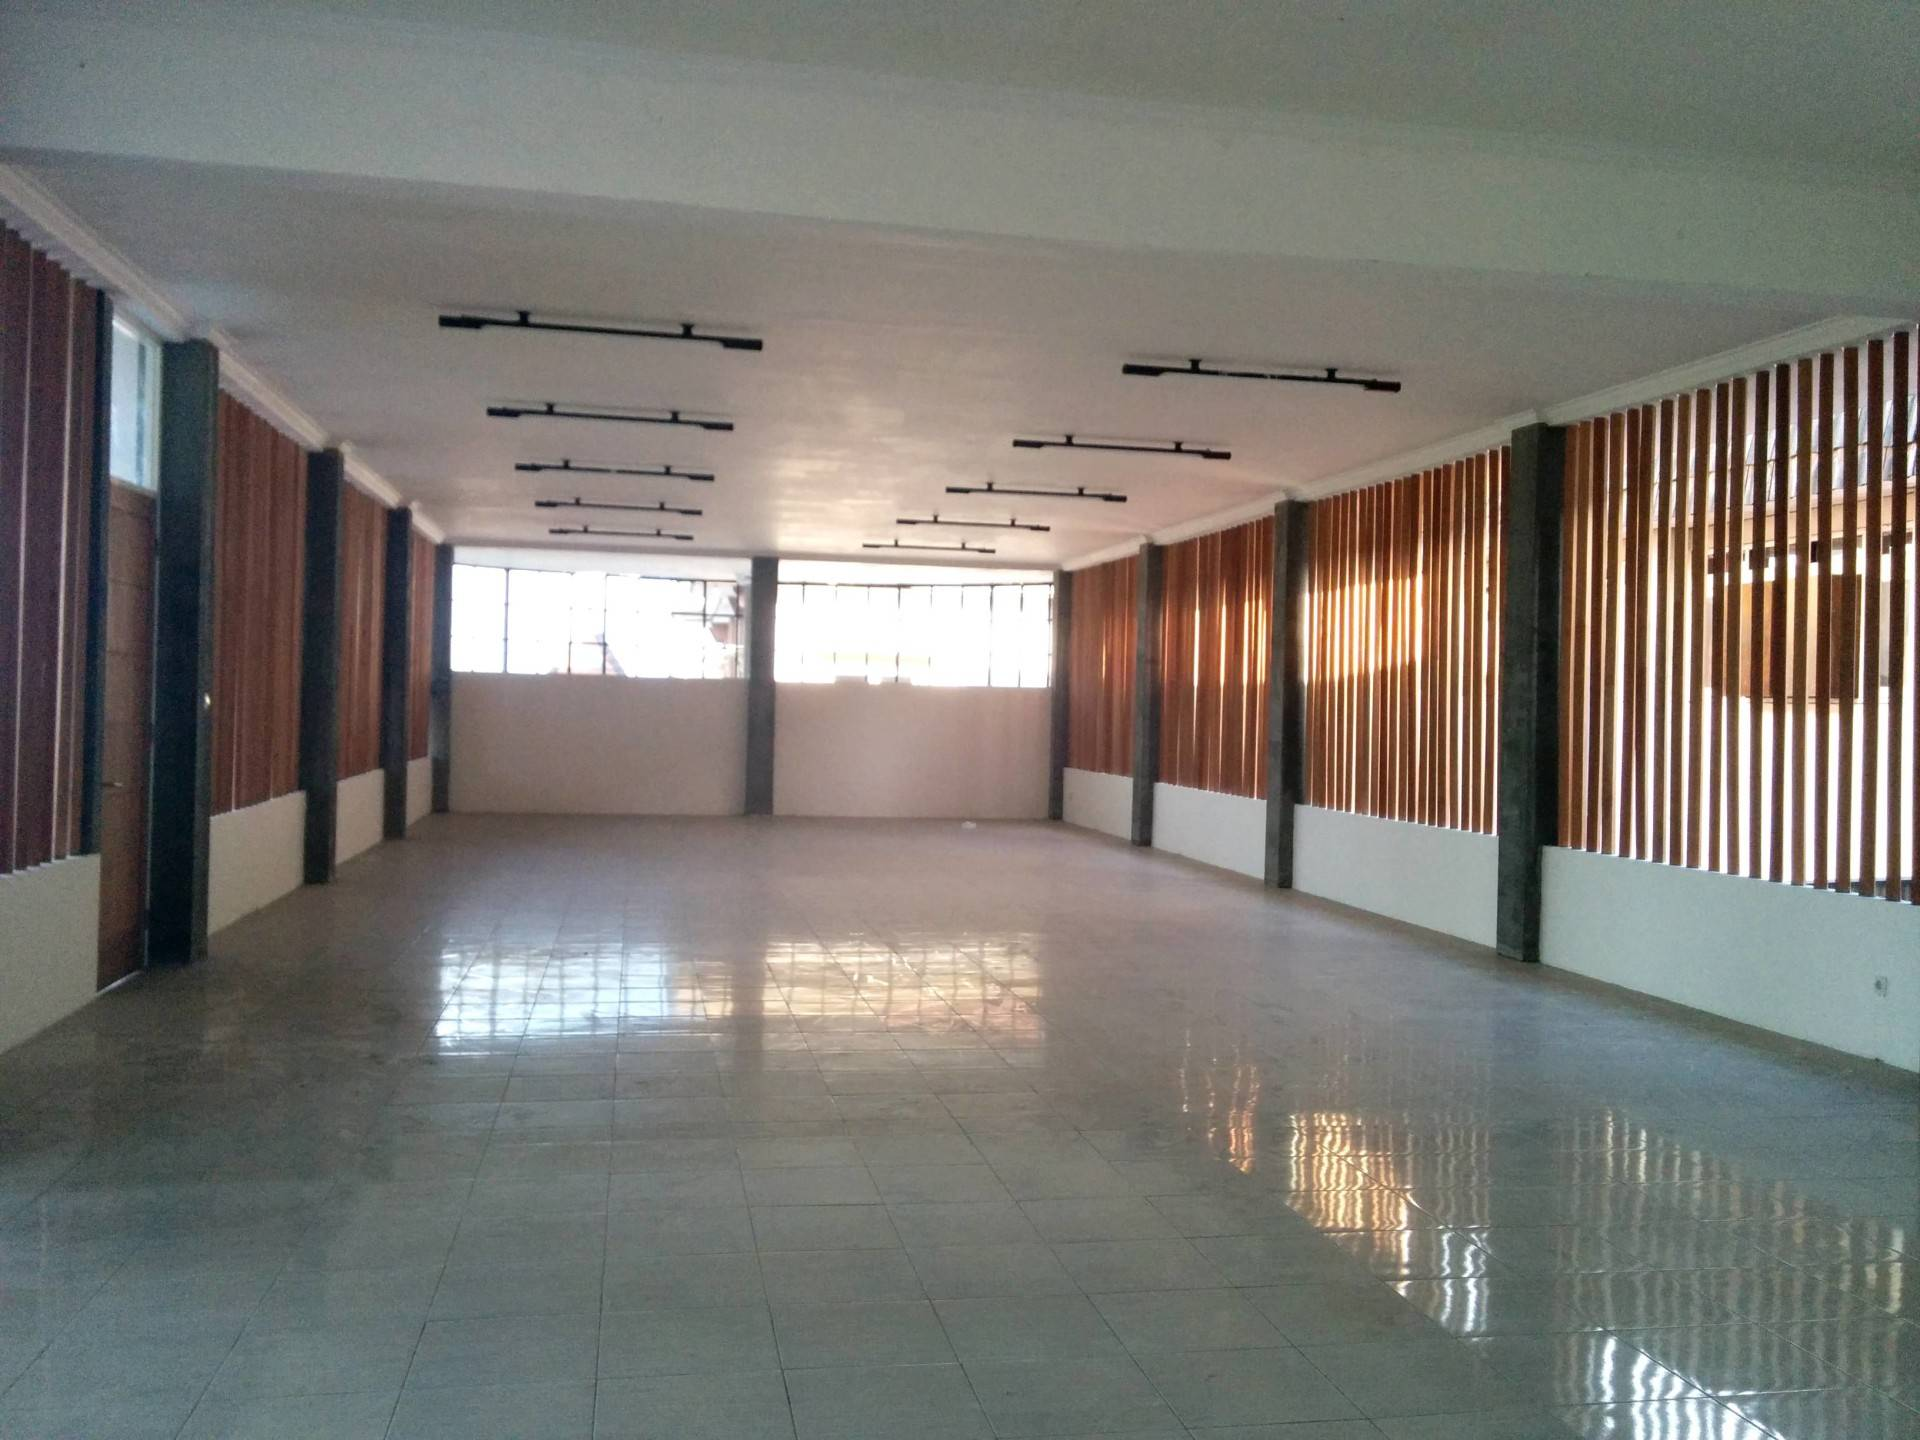 Haris Wibisono, Iai Veteran Building At Kota Batu Malang, East Java, Indonesia Malang, East Java, Indonesia E-Interior-Aula   2525